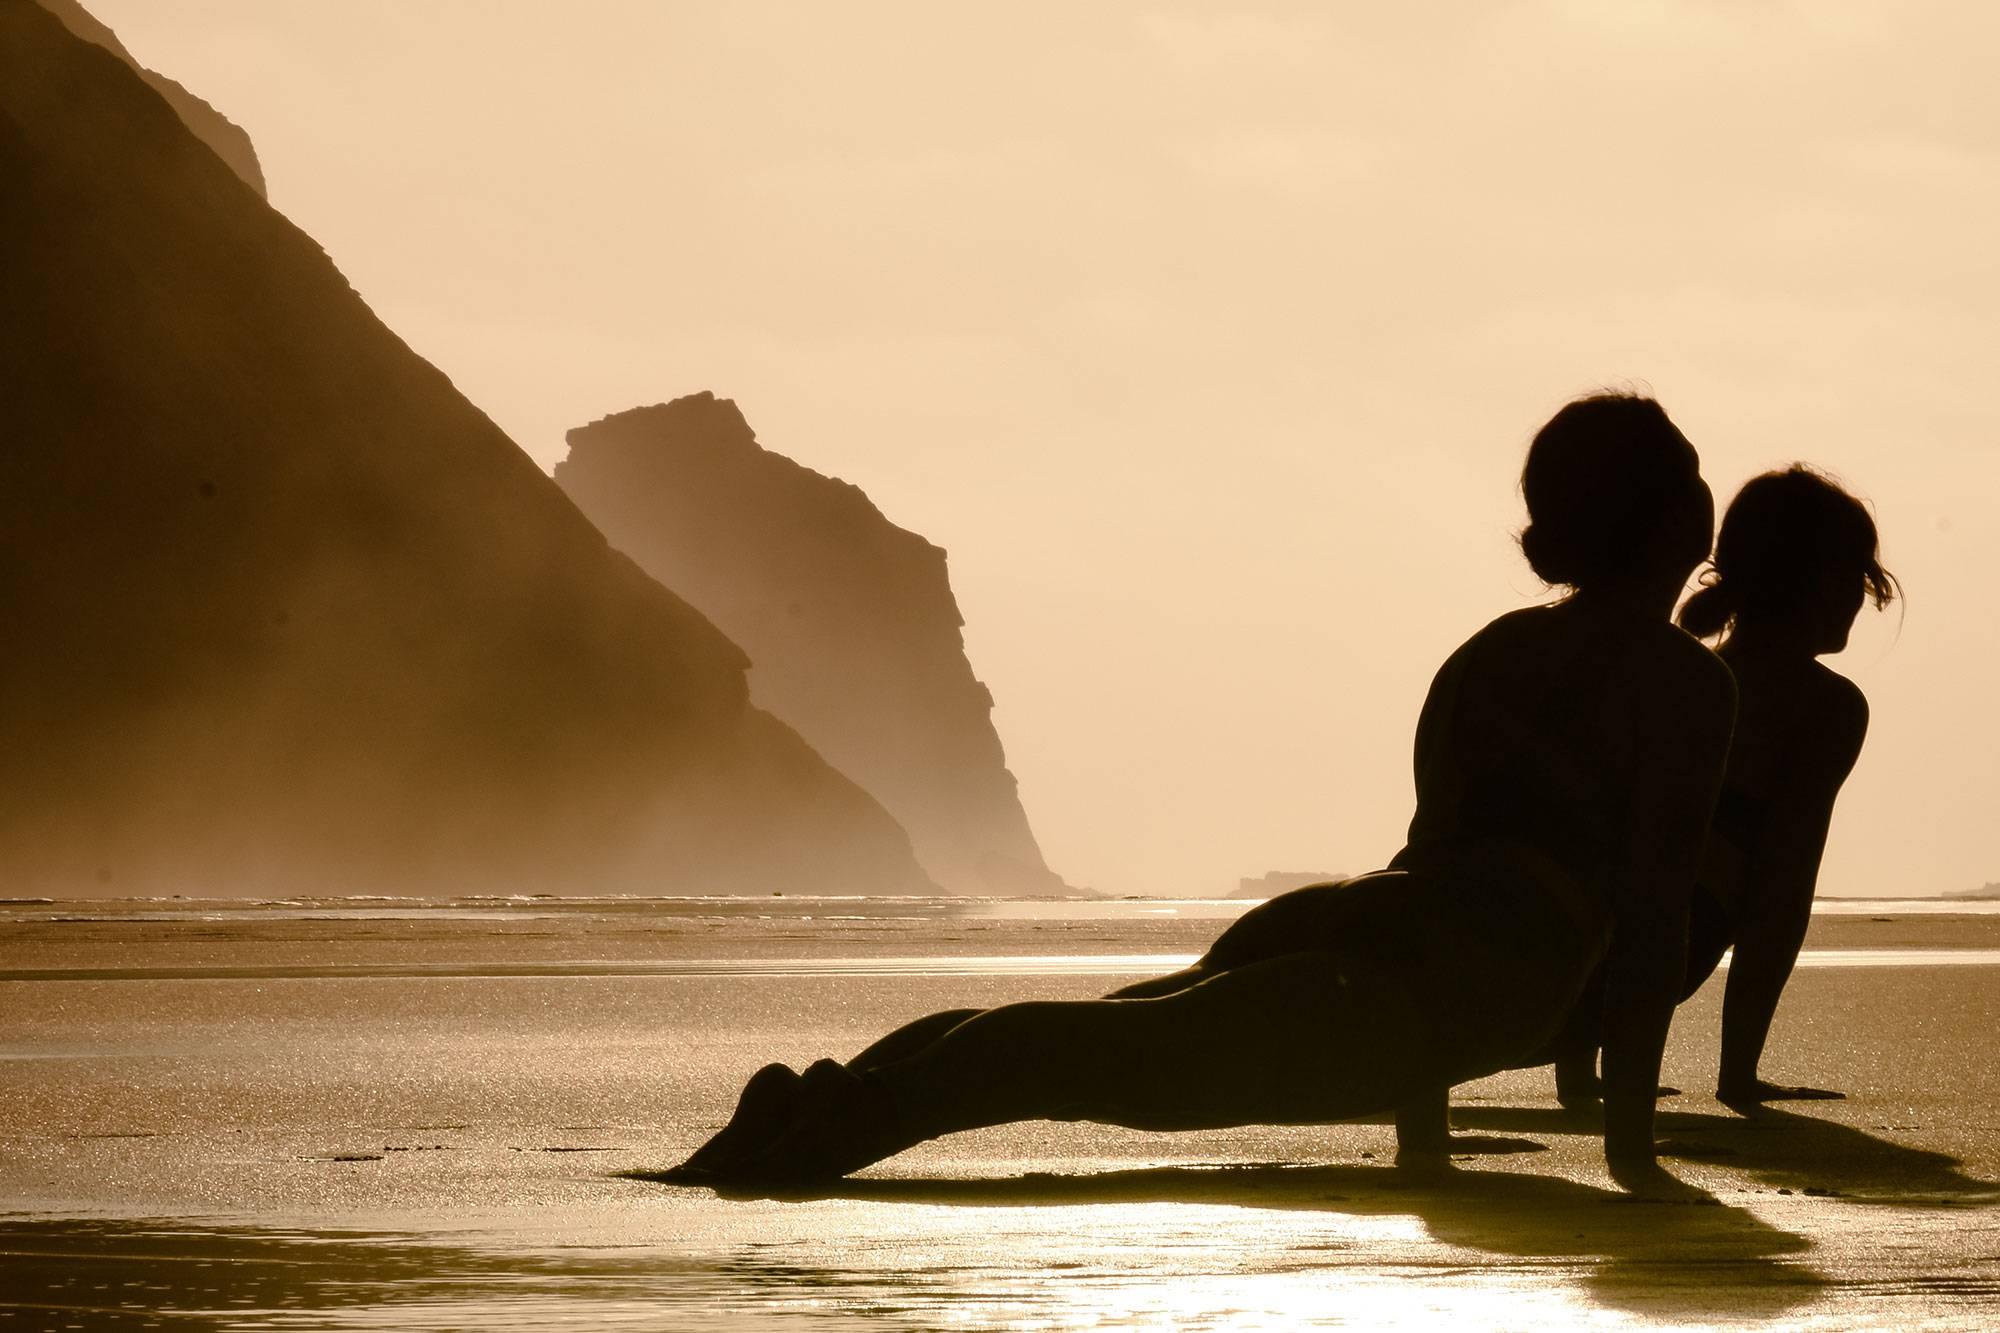 https://www.soulandsurf.com/wp-content/uploads/2021/07/@katiearaephoto_Yoga_On-the-beach_2.jpg